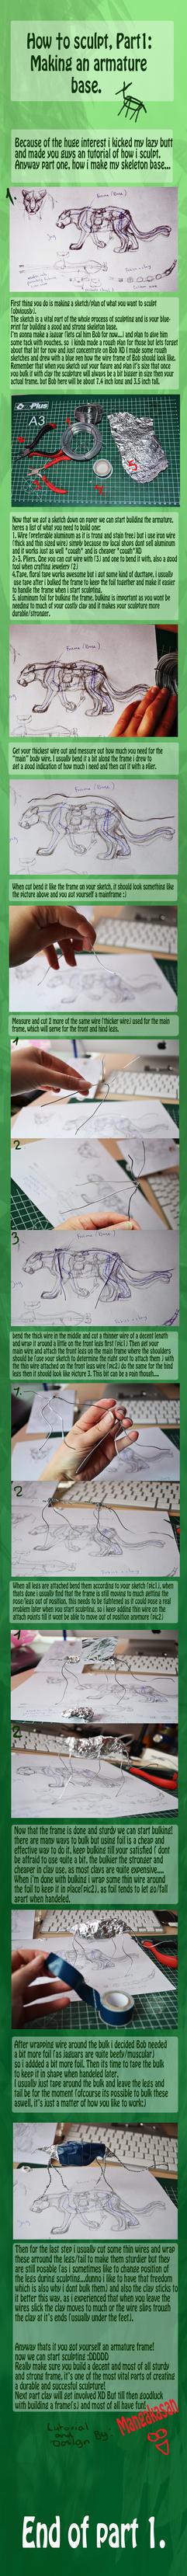 sculpting tut part1: armature base by mangakasan